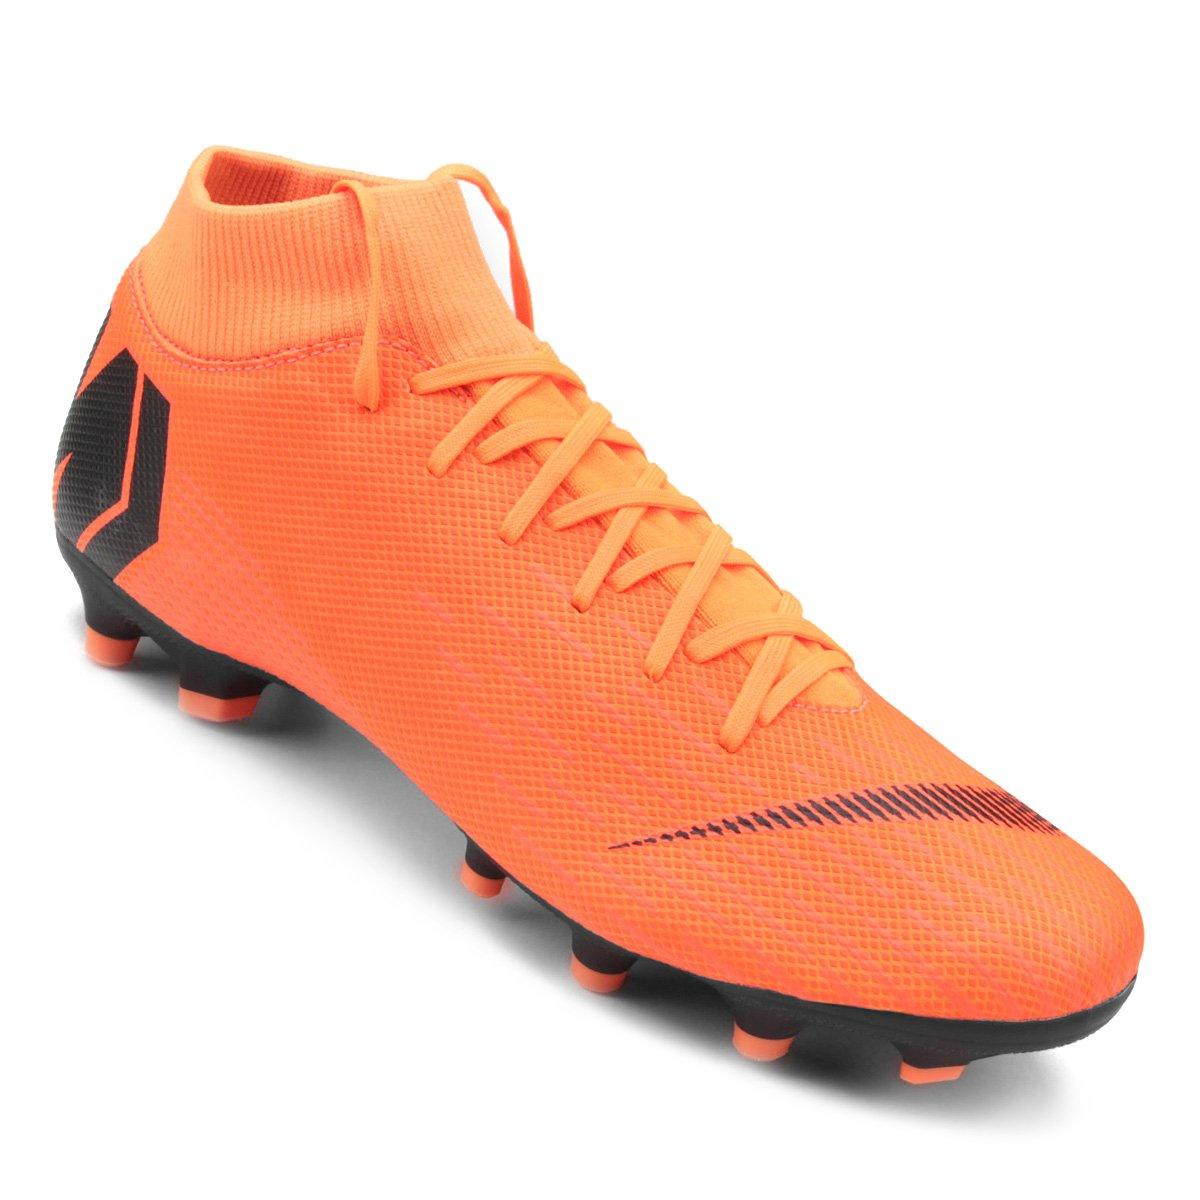 wholesale dealer 41ecc 98f12 Chuteira Campo Nike Mercurial Superfly 6 Academy - Laranja e Preto